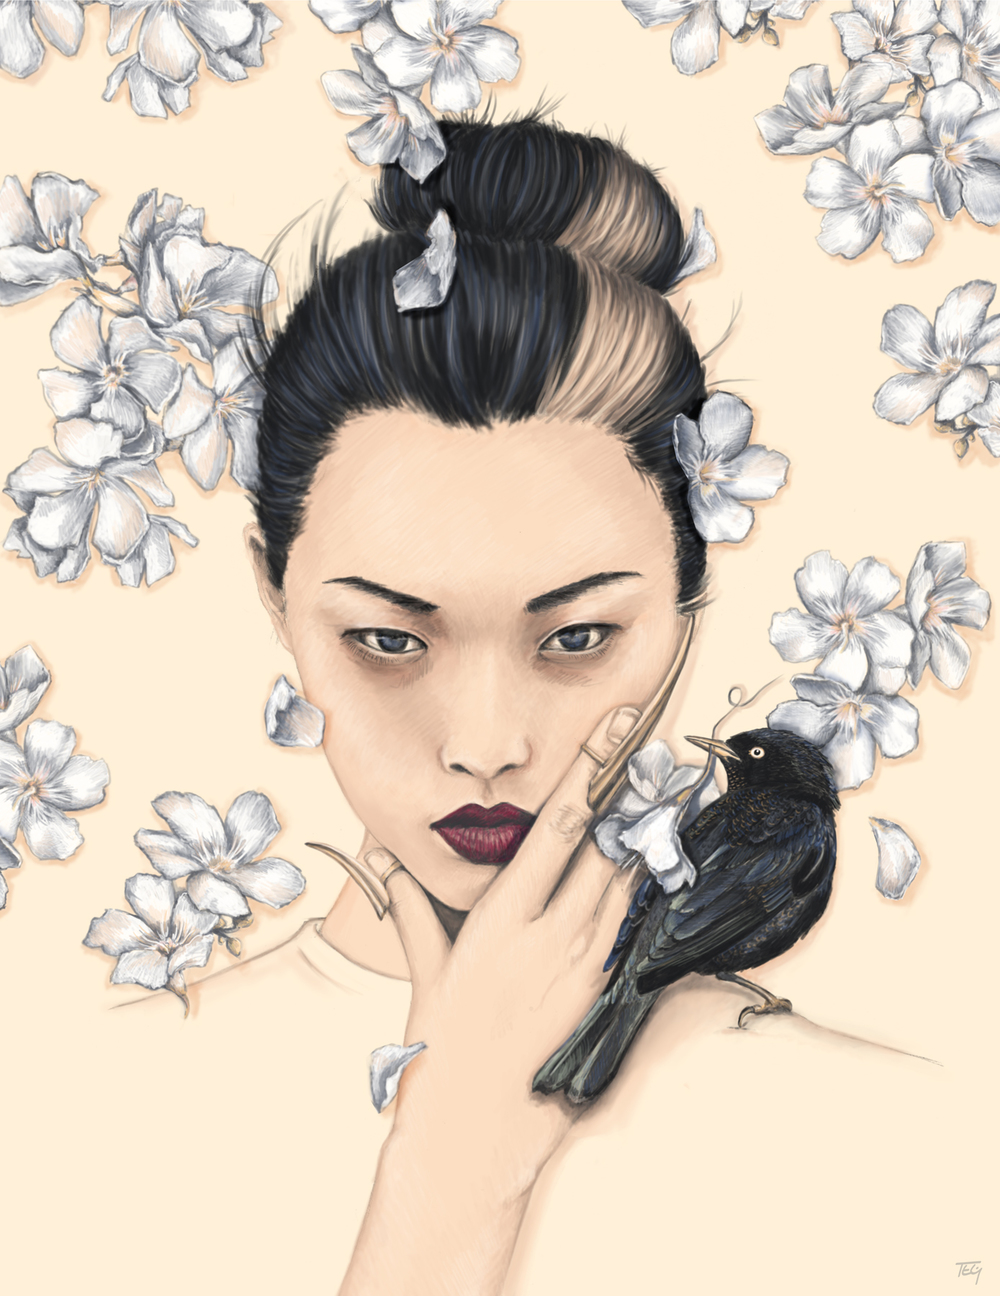 White Oleander - graphite & digital painting, 2015